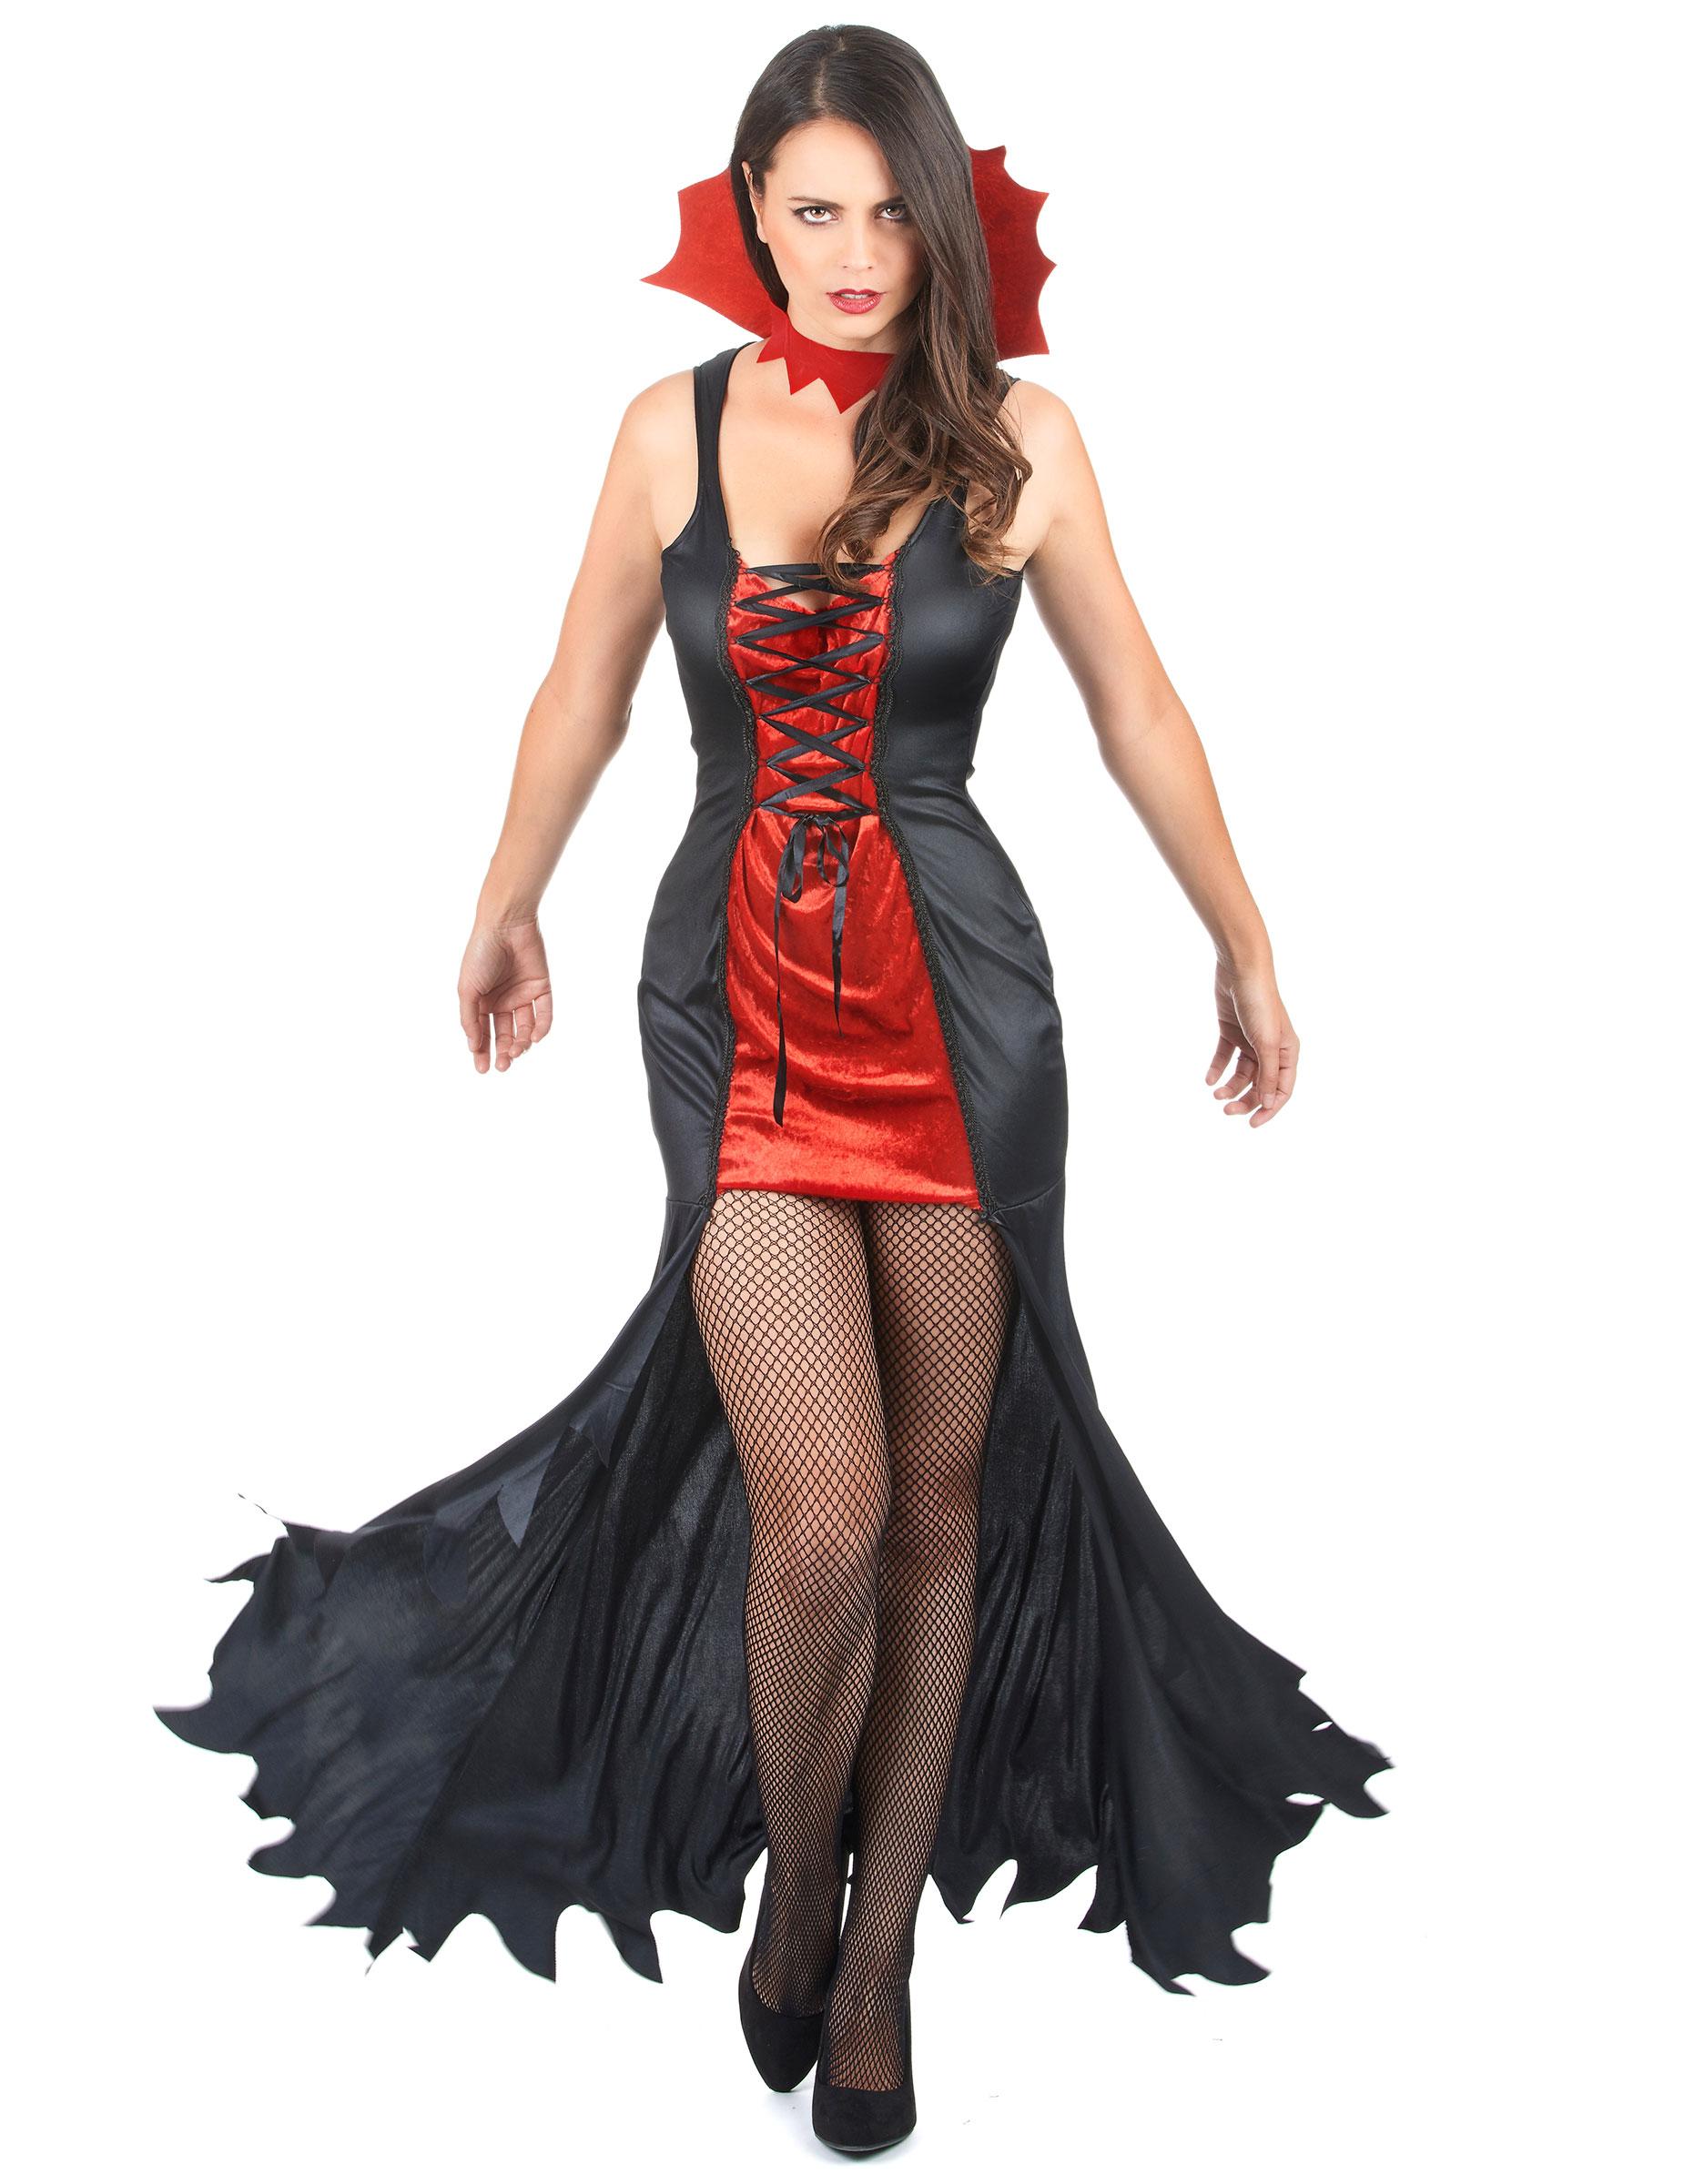 Vampir Kostm Damen Halloween Kostme Fr Erwachseneund